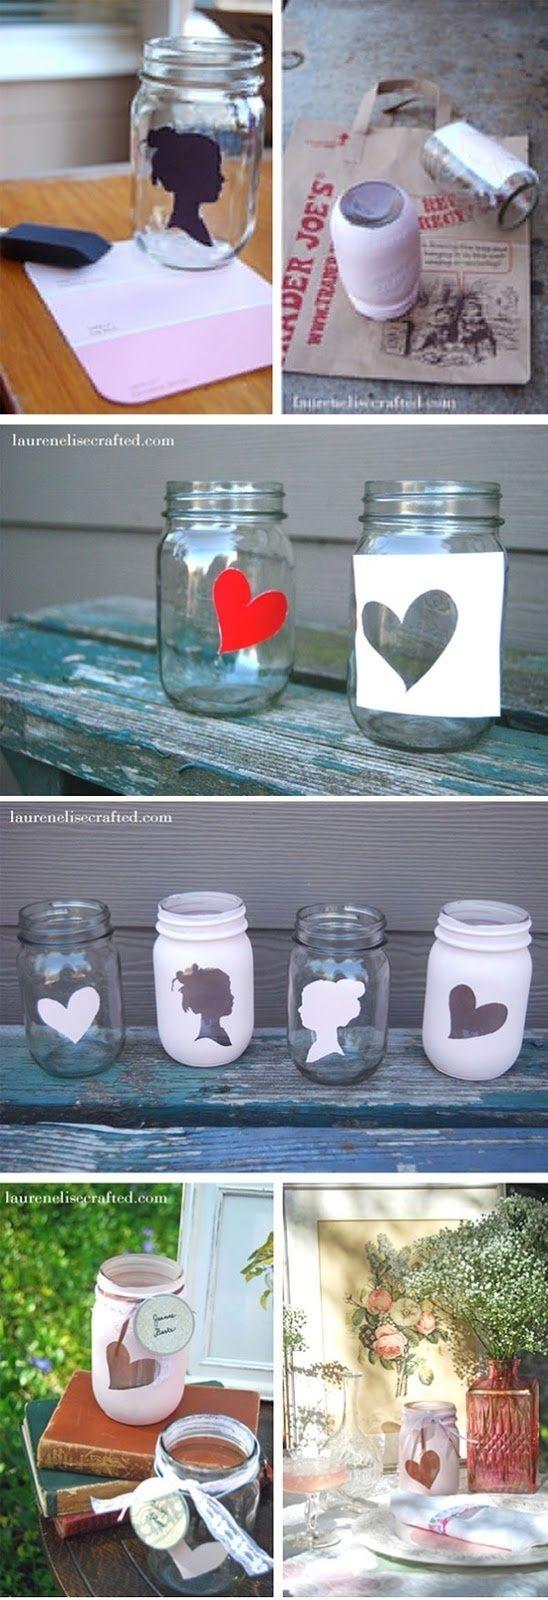 DIY Painting Jars - Inspiring picture on Joyzz.com